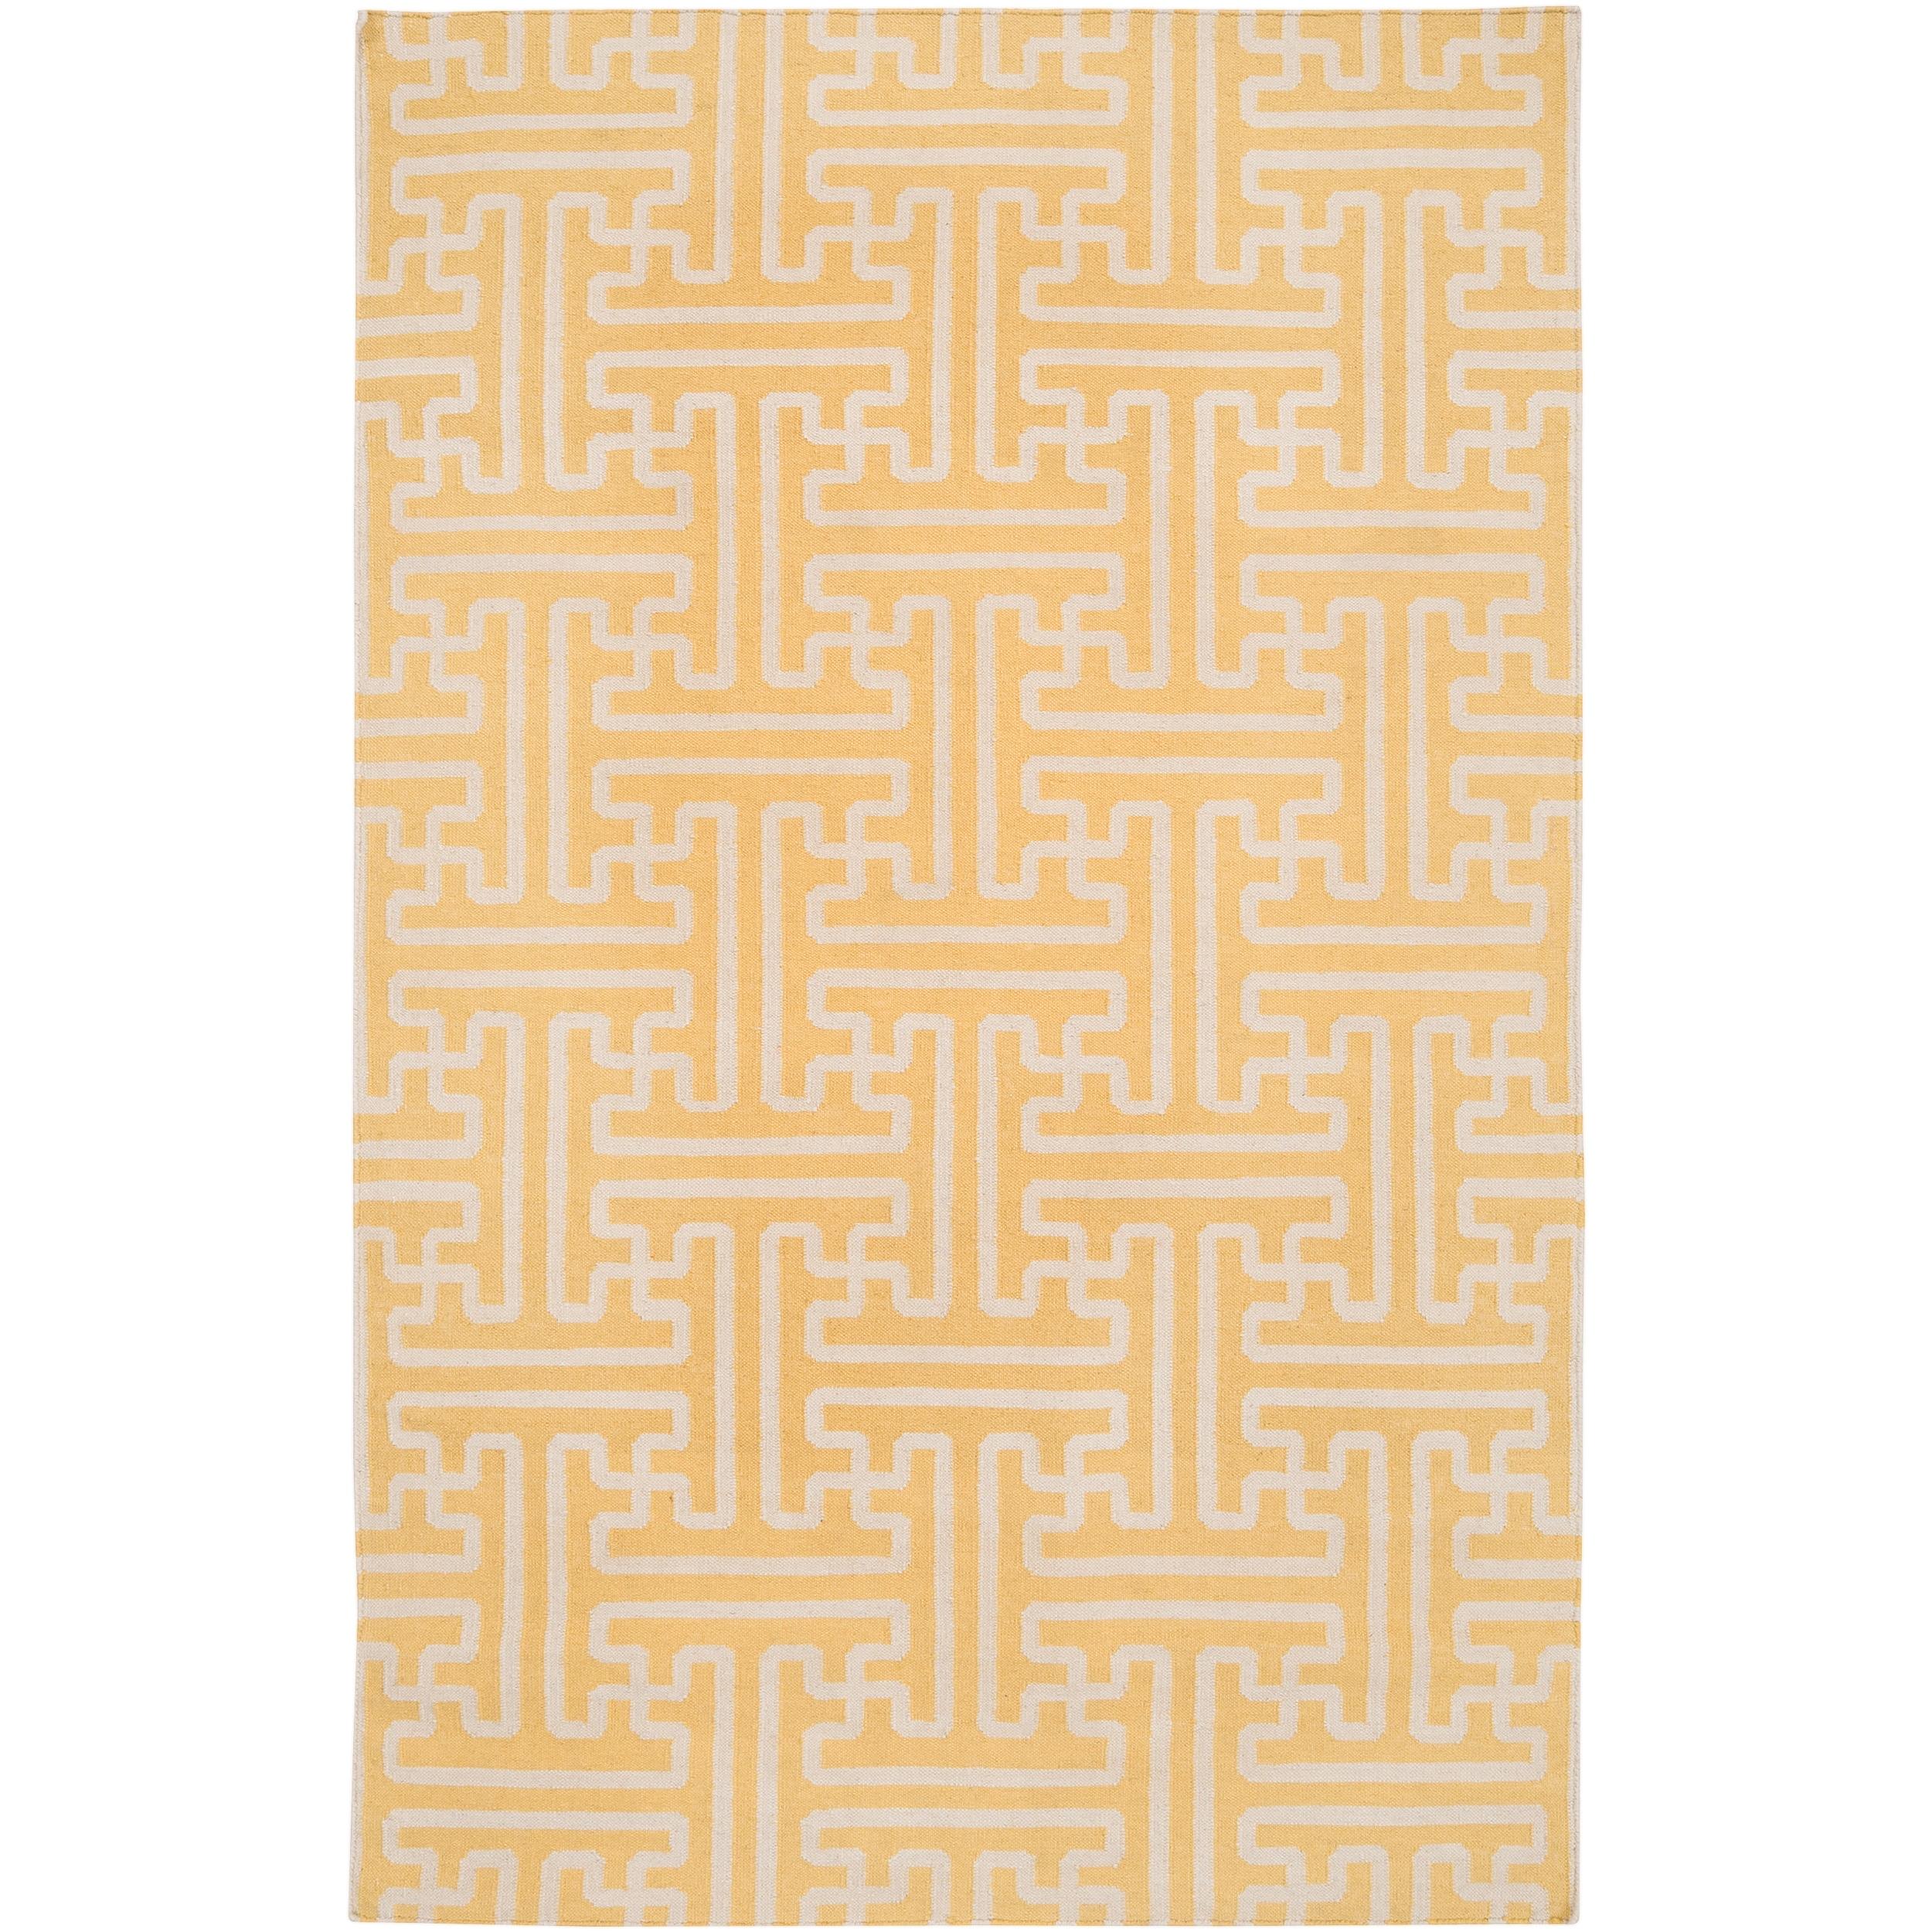 Hand-woven Yellow Antima Wool Area Rug - 5' x 8'